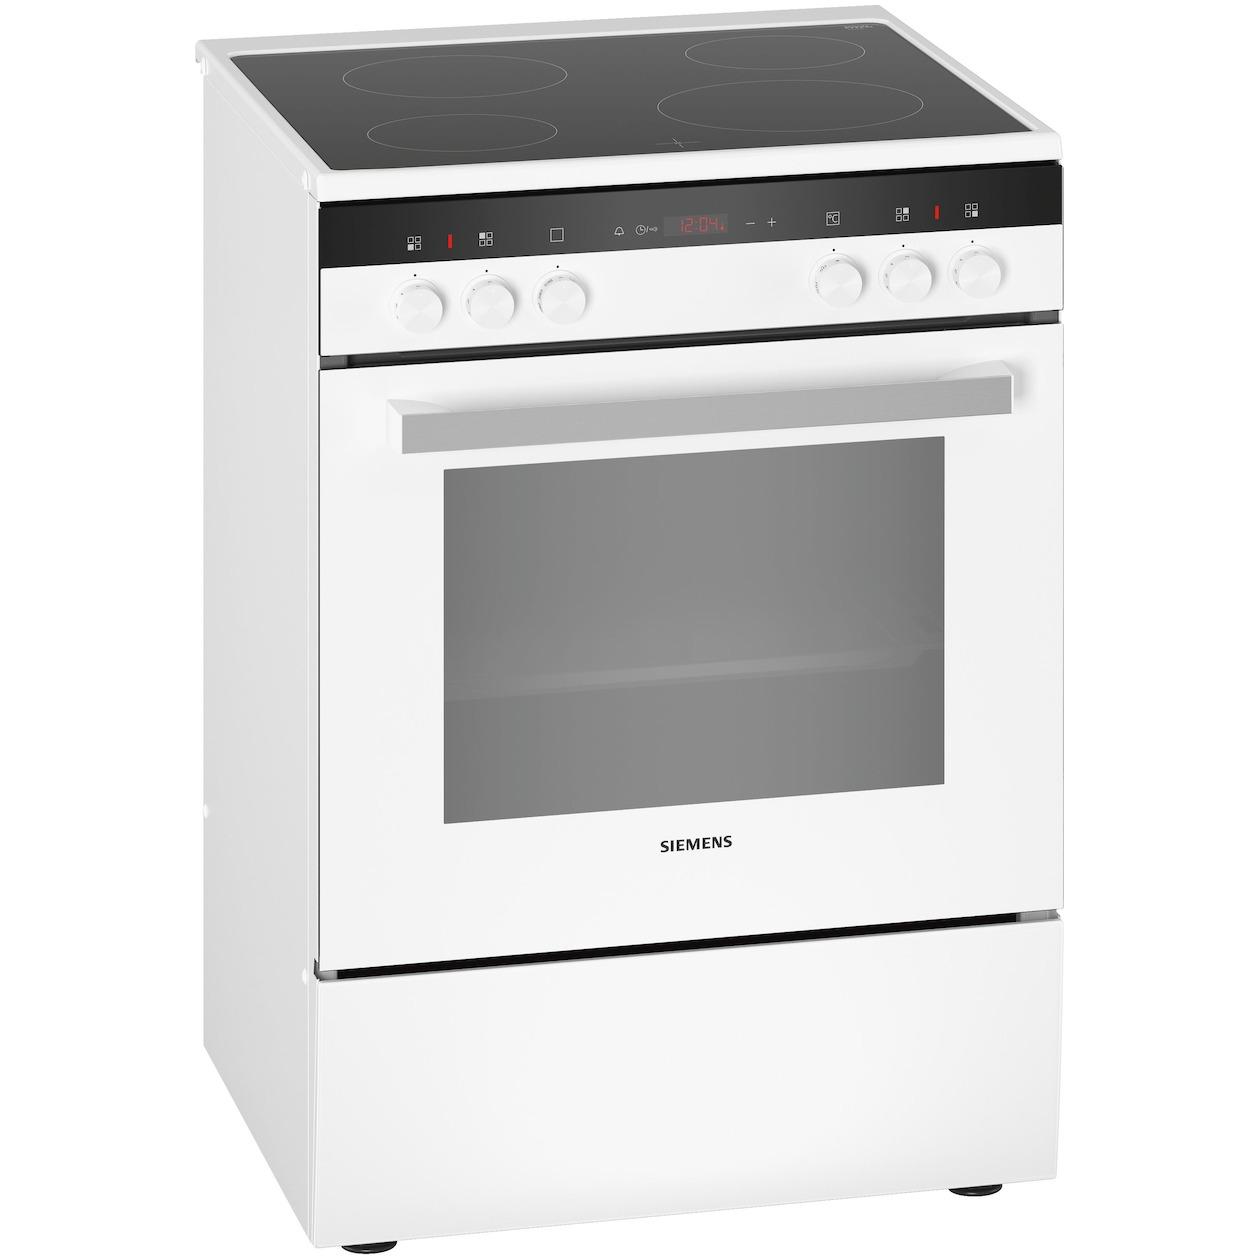 Siemens HK9R30020 wit